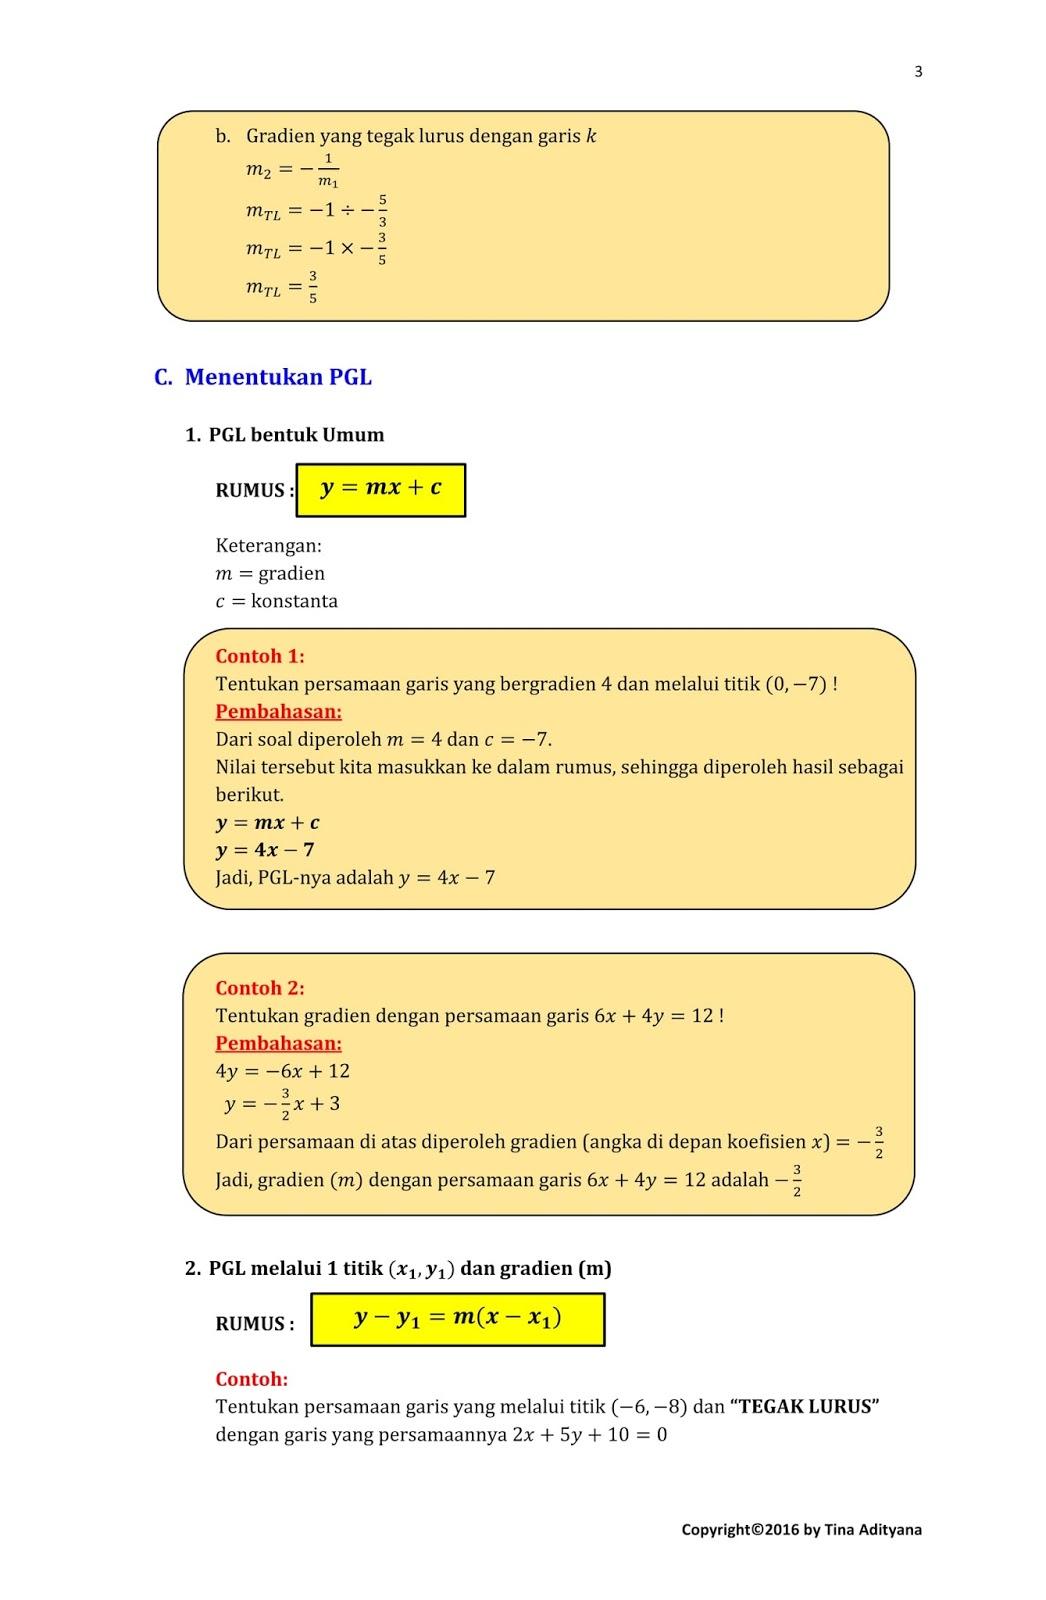 Handout Persamaan Garis Lurus Pgl Matematika Kita